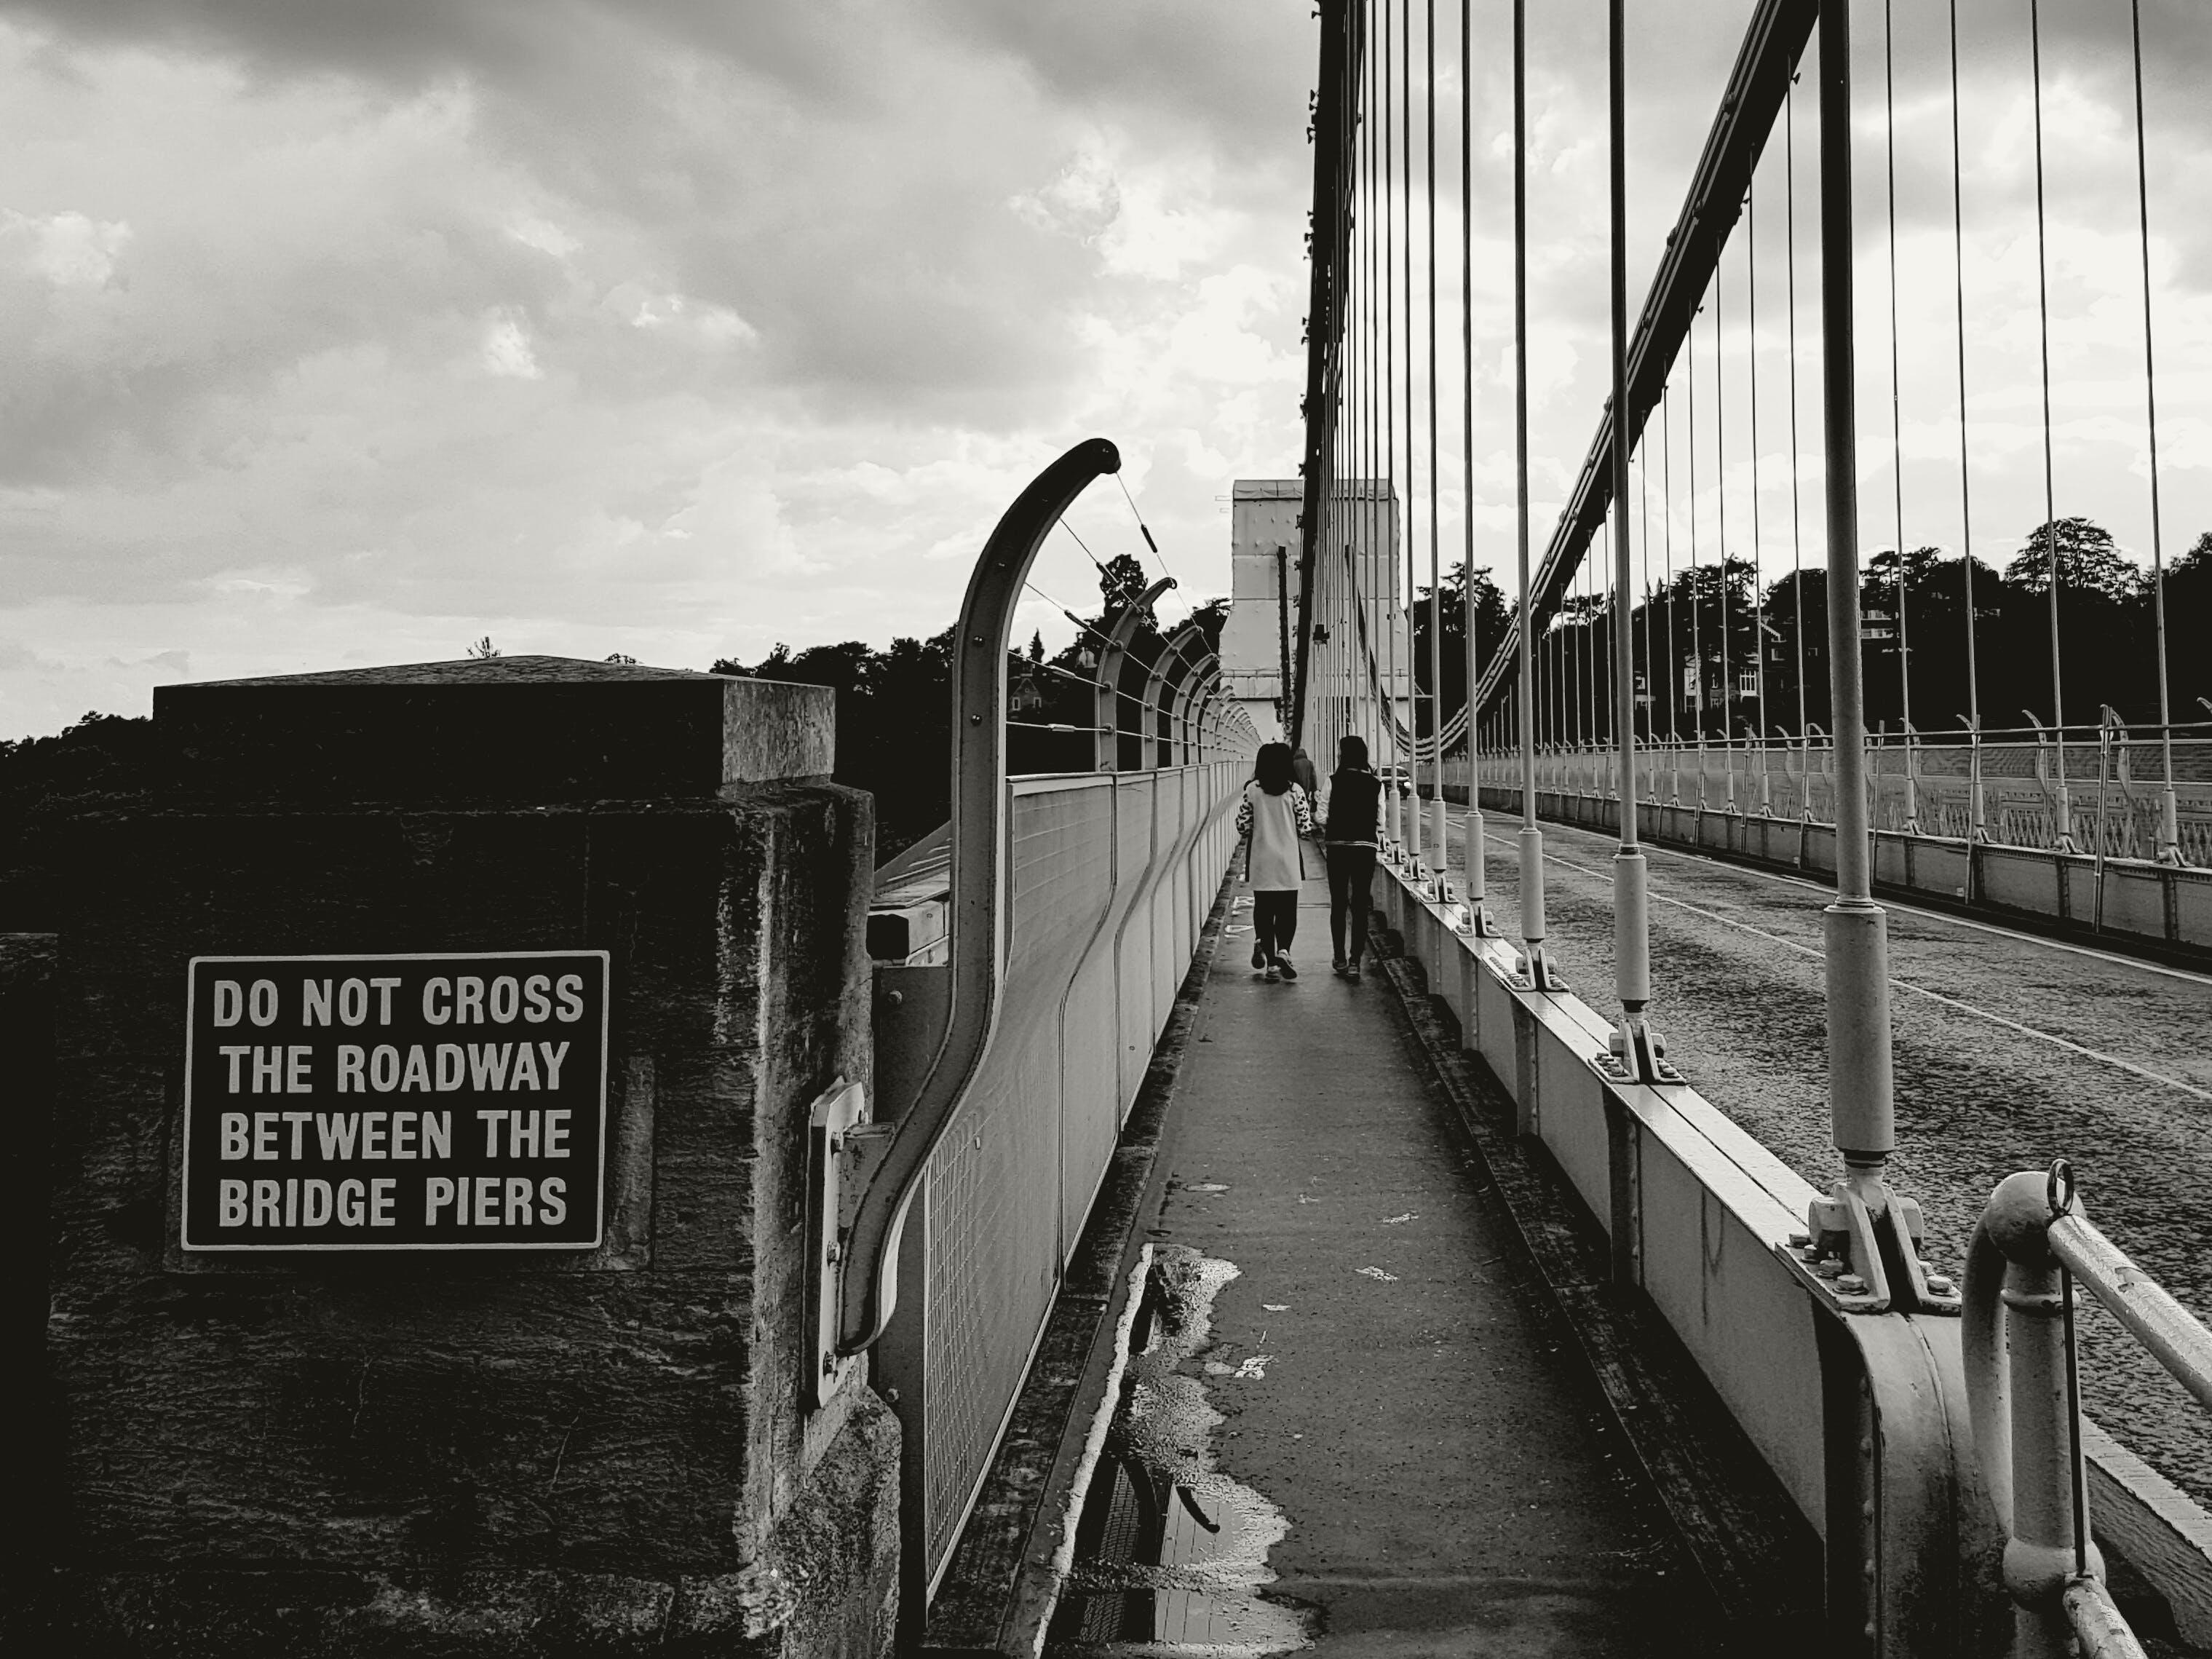 Two People Walking on the Sidewalk of the Bridge